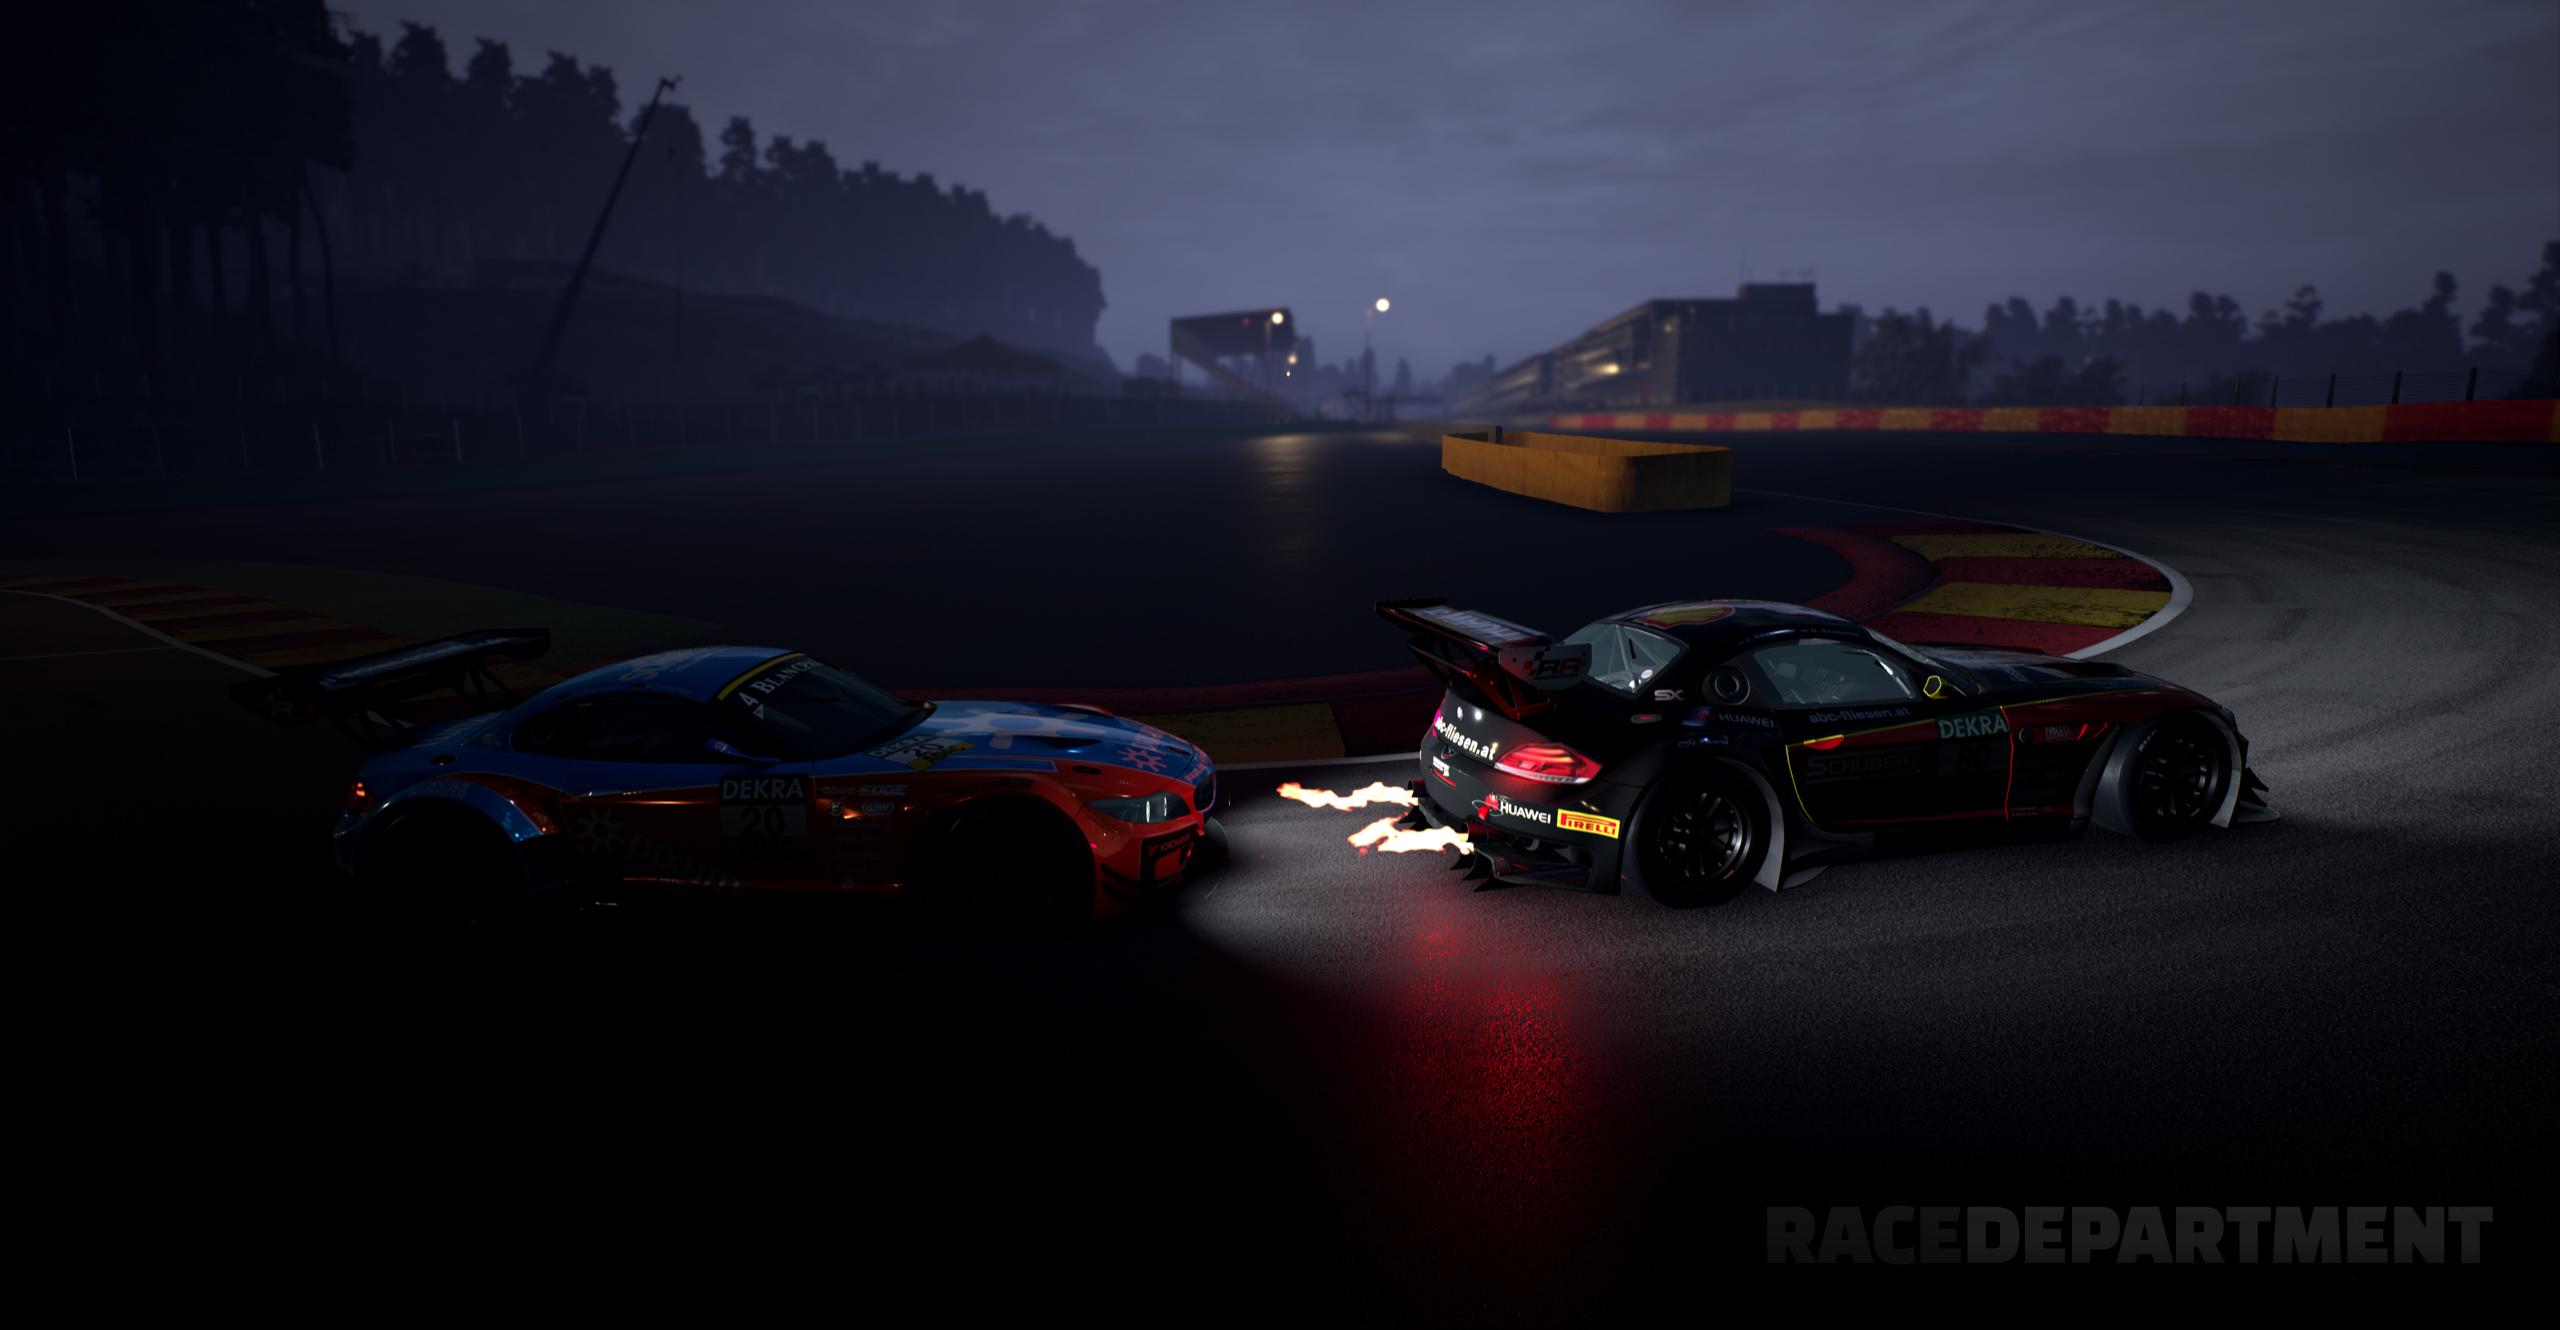 GTR 3 simbin studios screenshot night racing